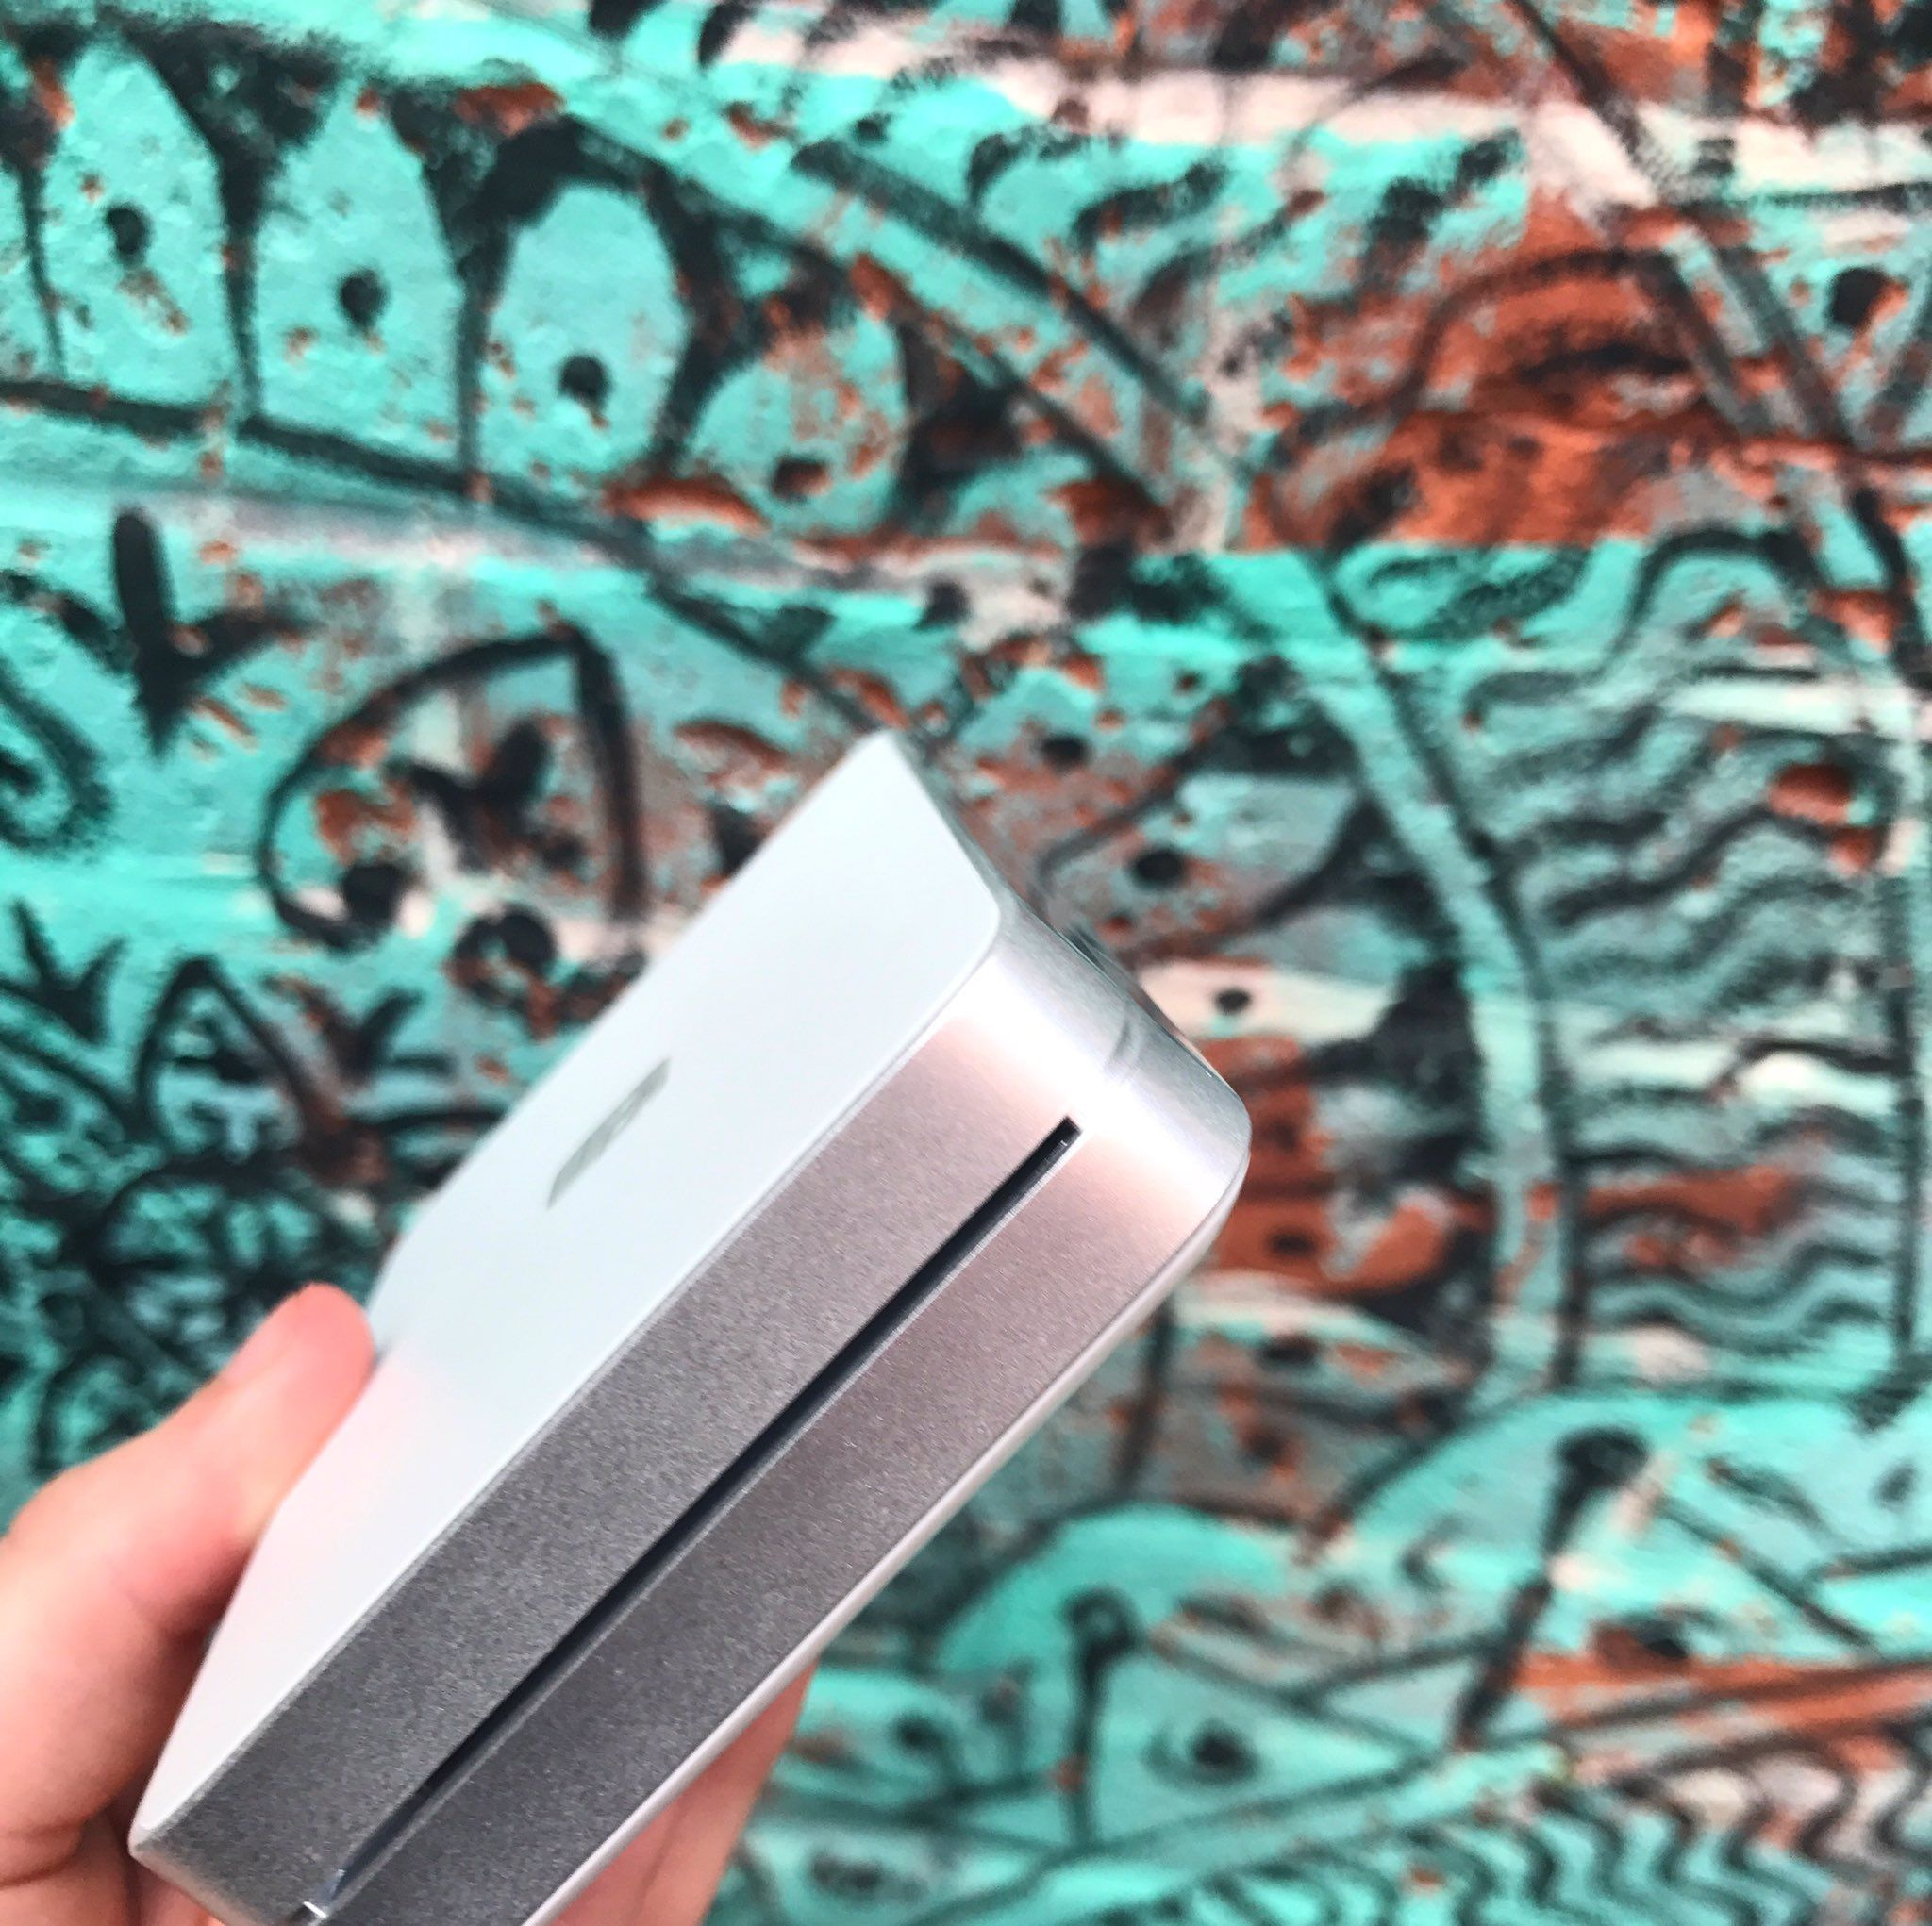 "Lifeprint on Twitter: ""Loving the vibes here 🙌🏻 #summerfun #lifeprint #graffiti #nyc #mobileprinter #instant #travel #creativelife https://t.co/lVktoRXzhr"""